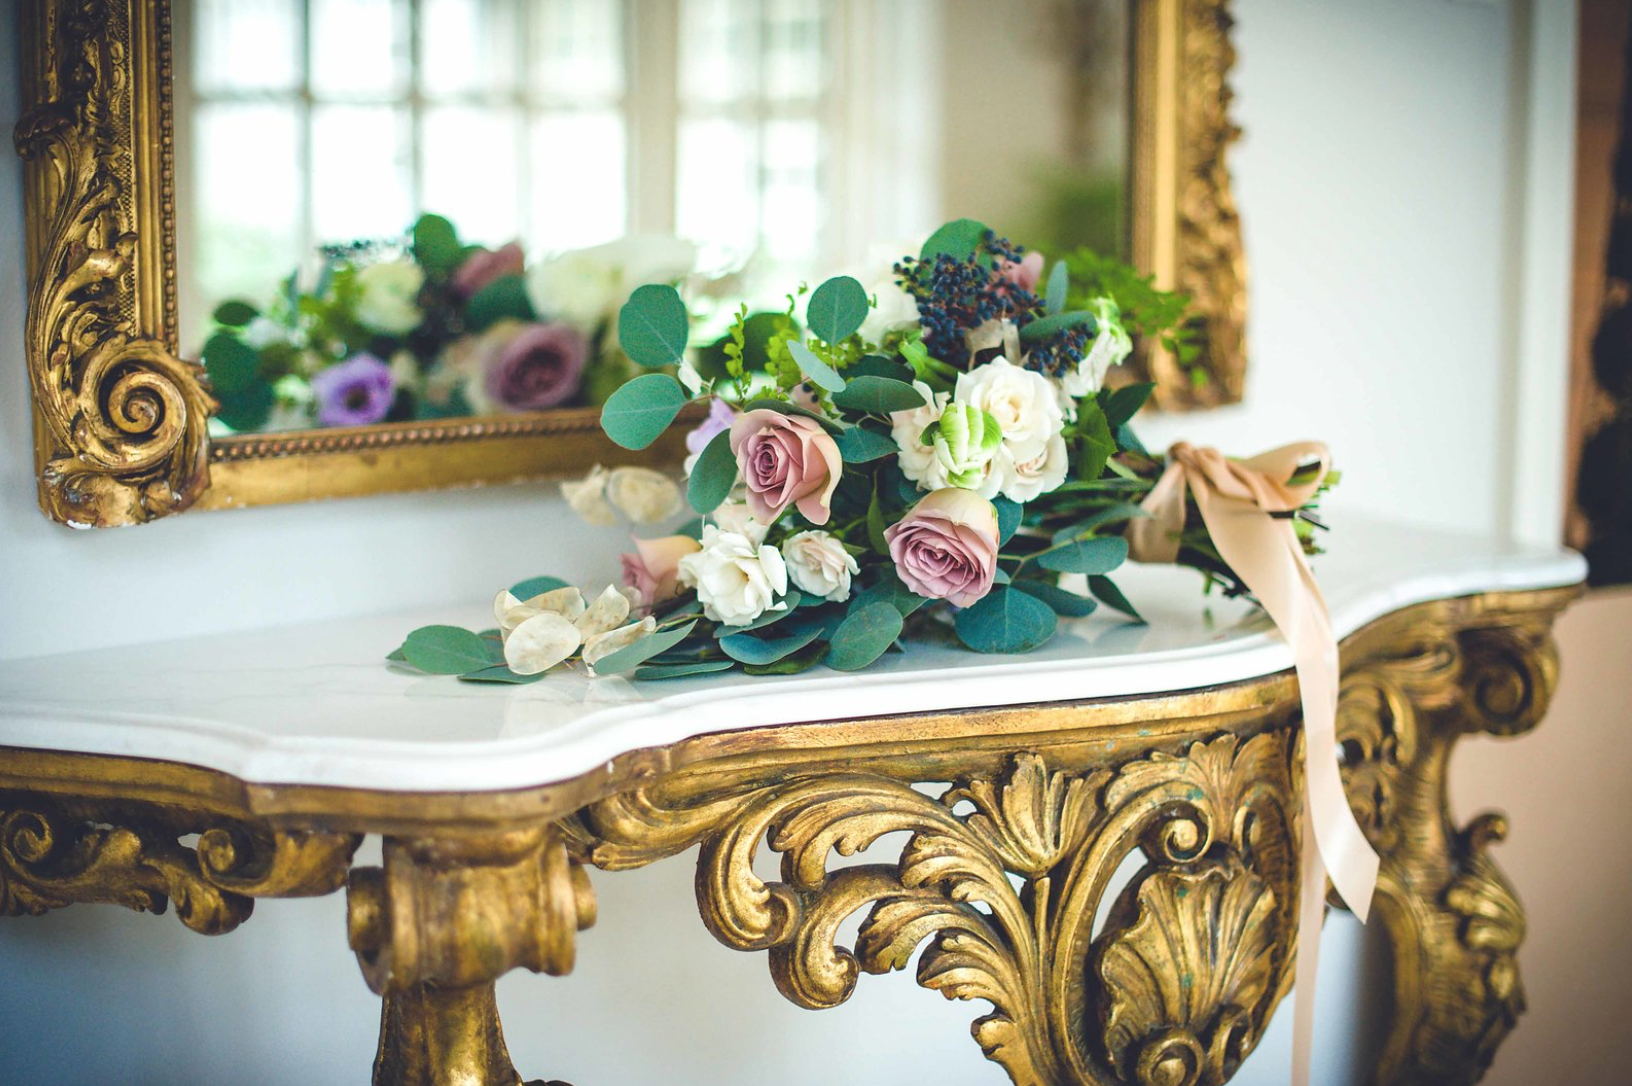 little-coterie-entertaning-party-decor-inspiration-ribbon-gilded-gold-ornate-lavender-mauve-purple-white-greenery-floral-bouquet-by-maxit-flower-design